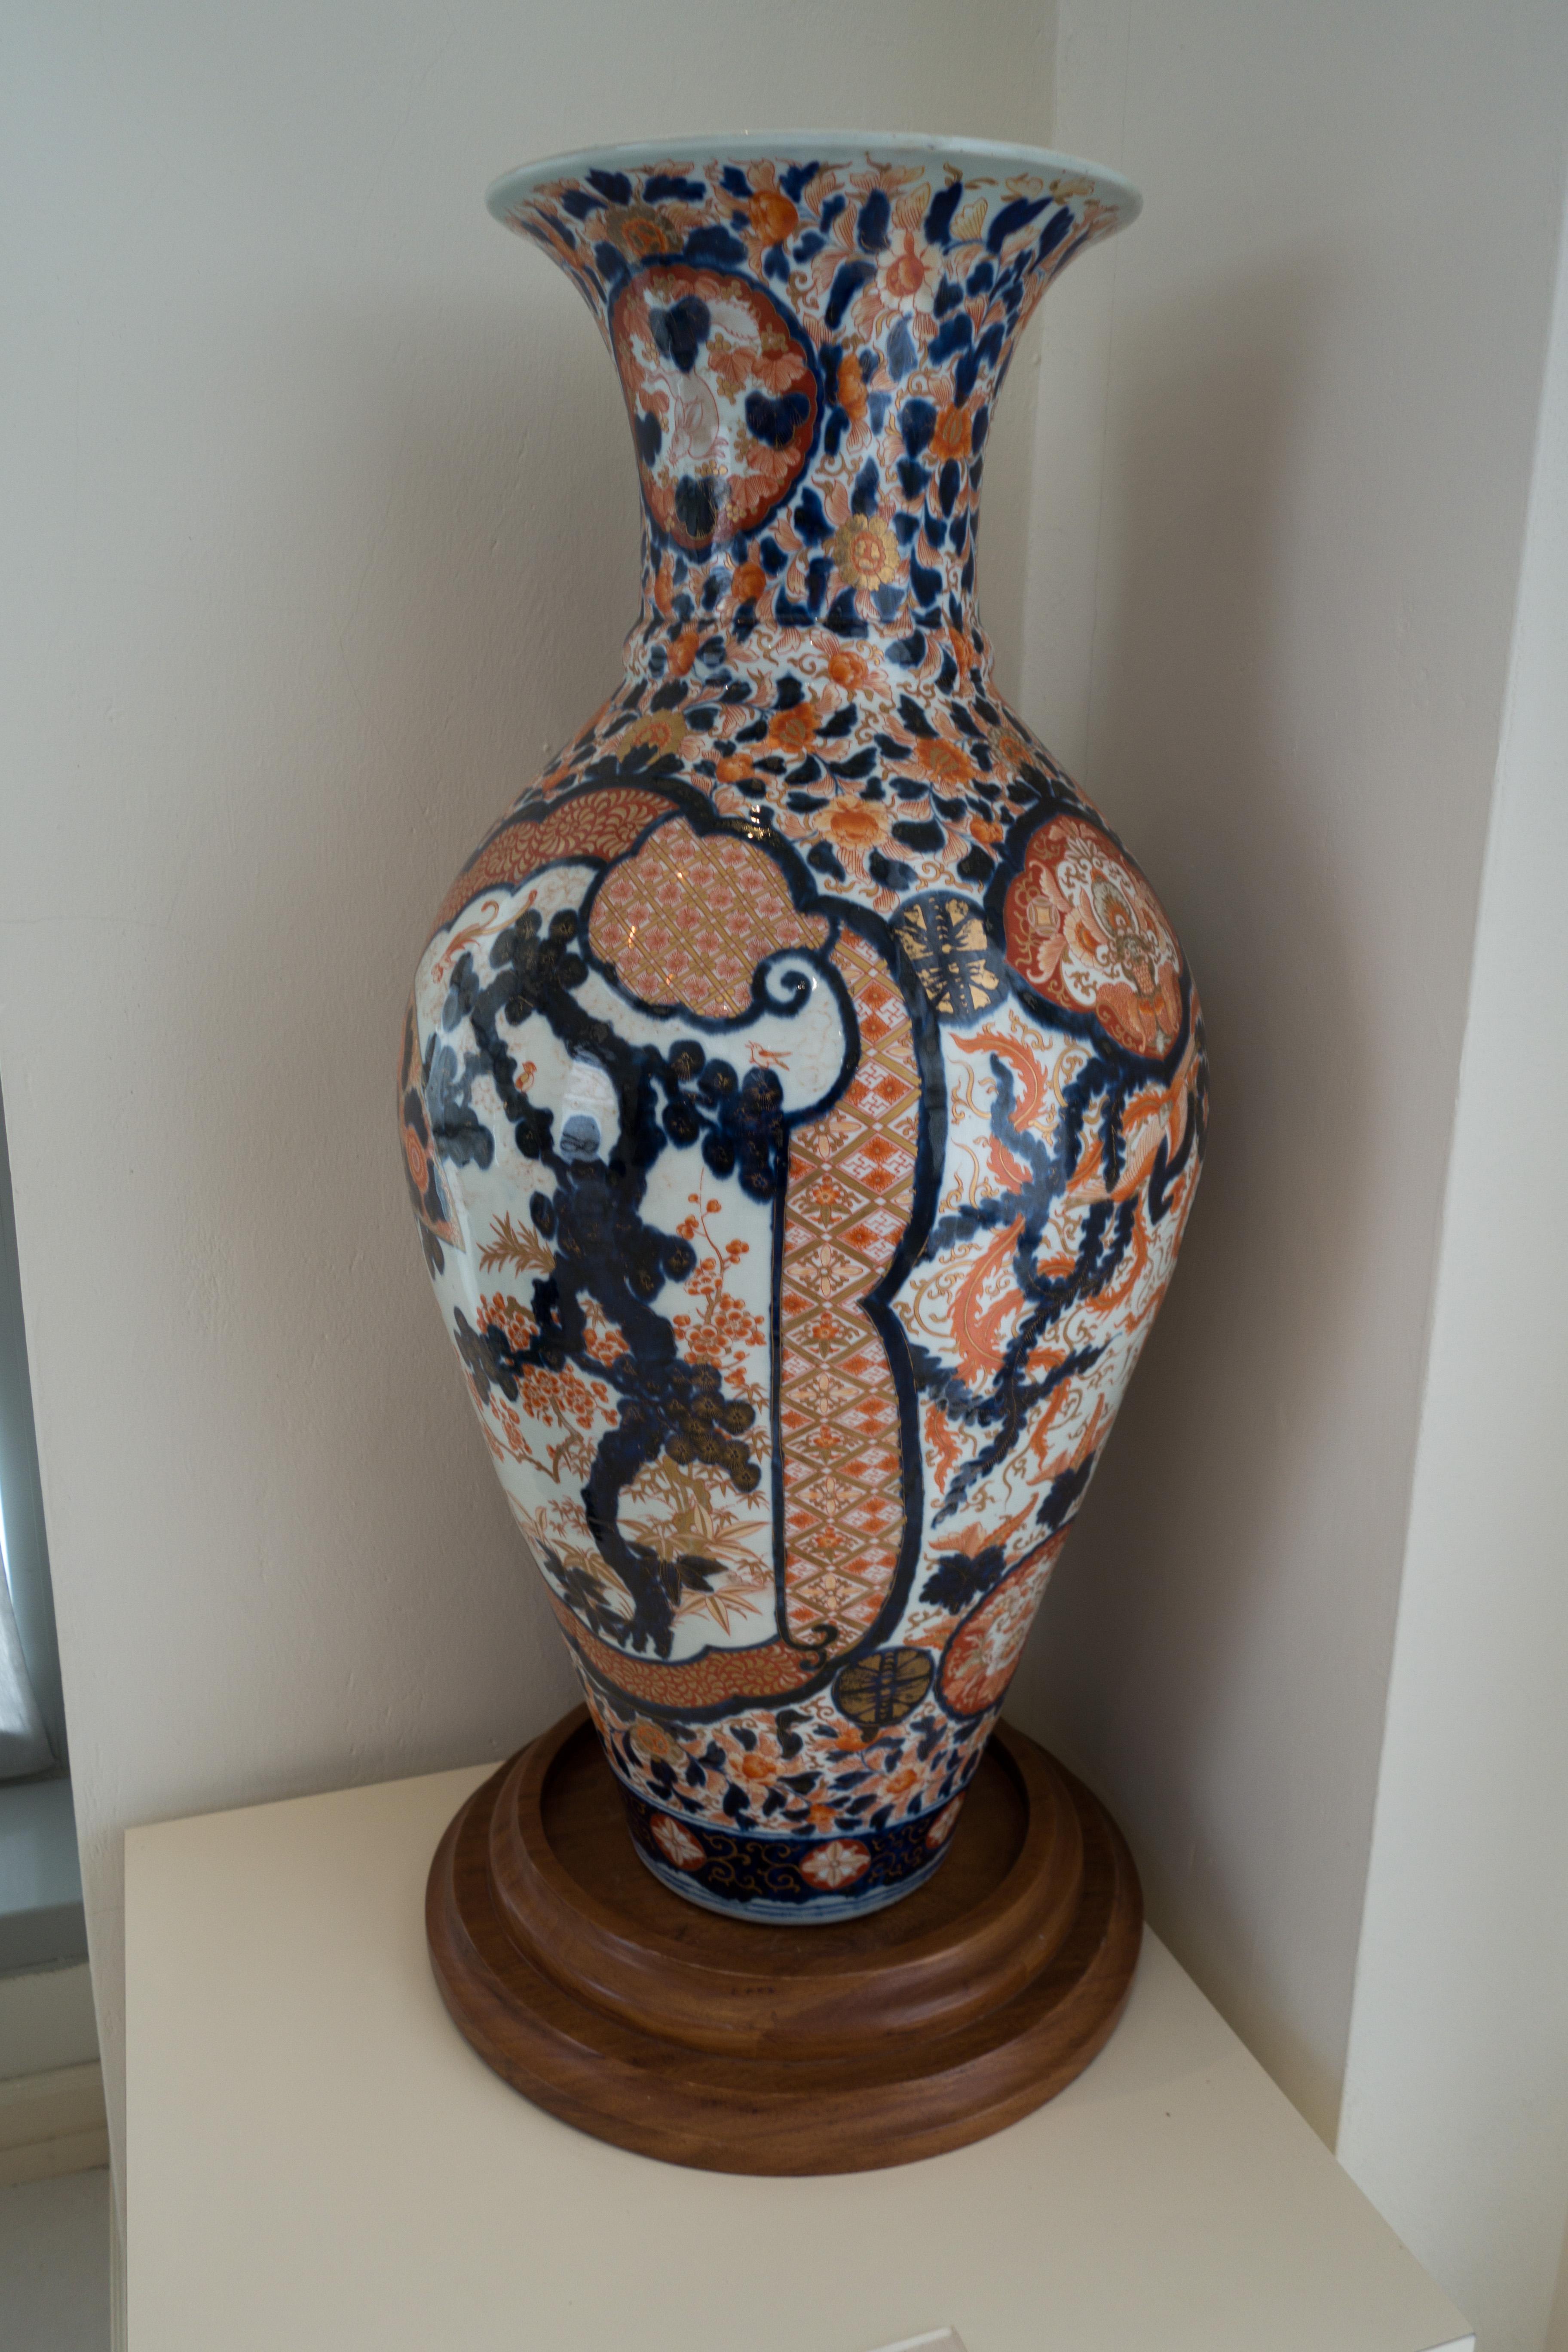 Fileantique japanese vase 25074477980g wikimedia commons fileantique japanese vase 25074477980g reviewsmspy